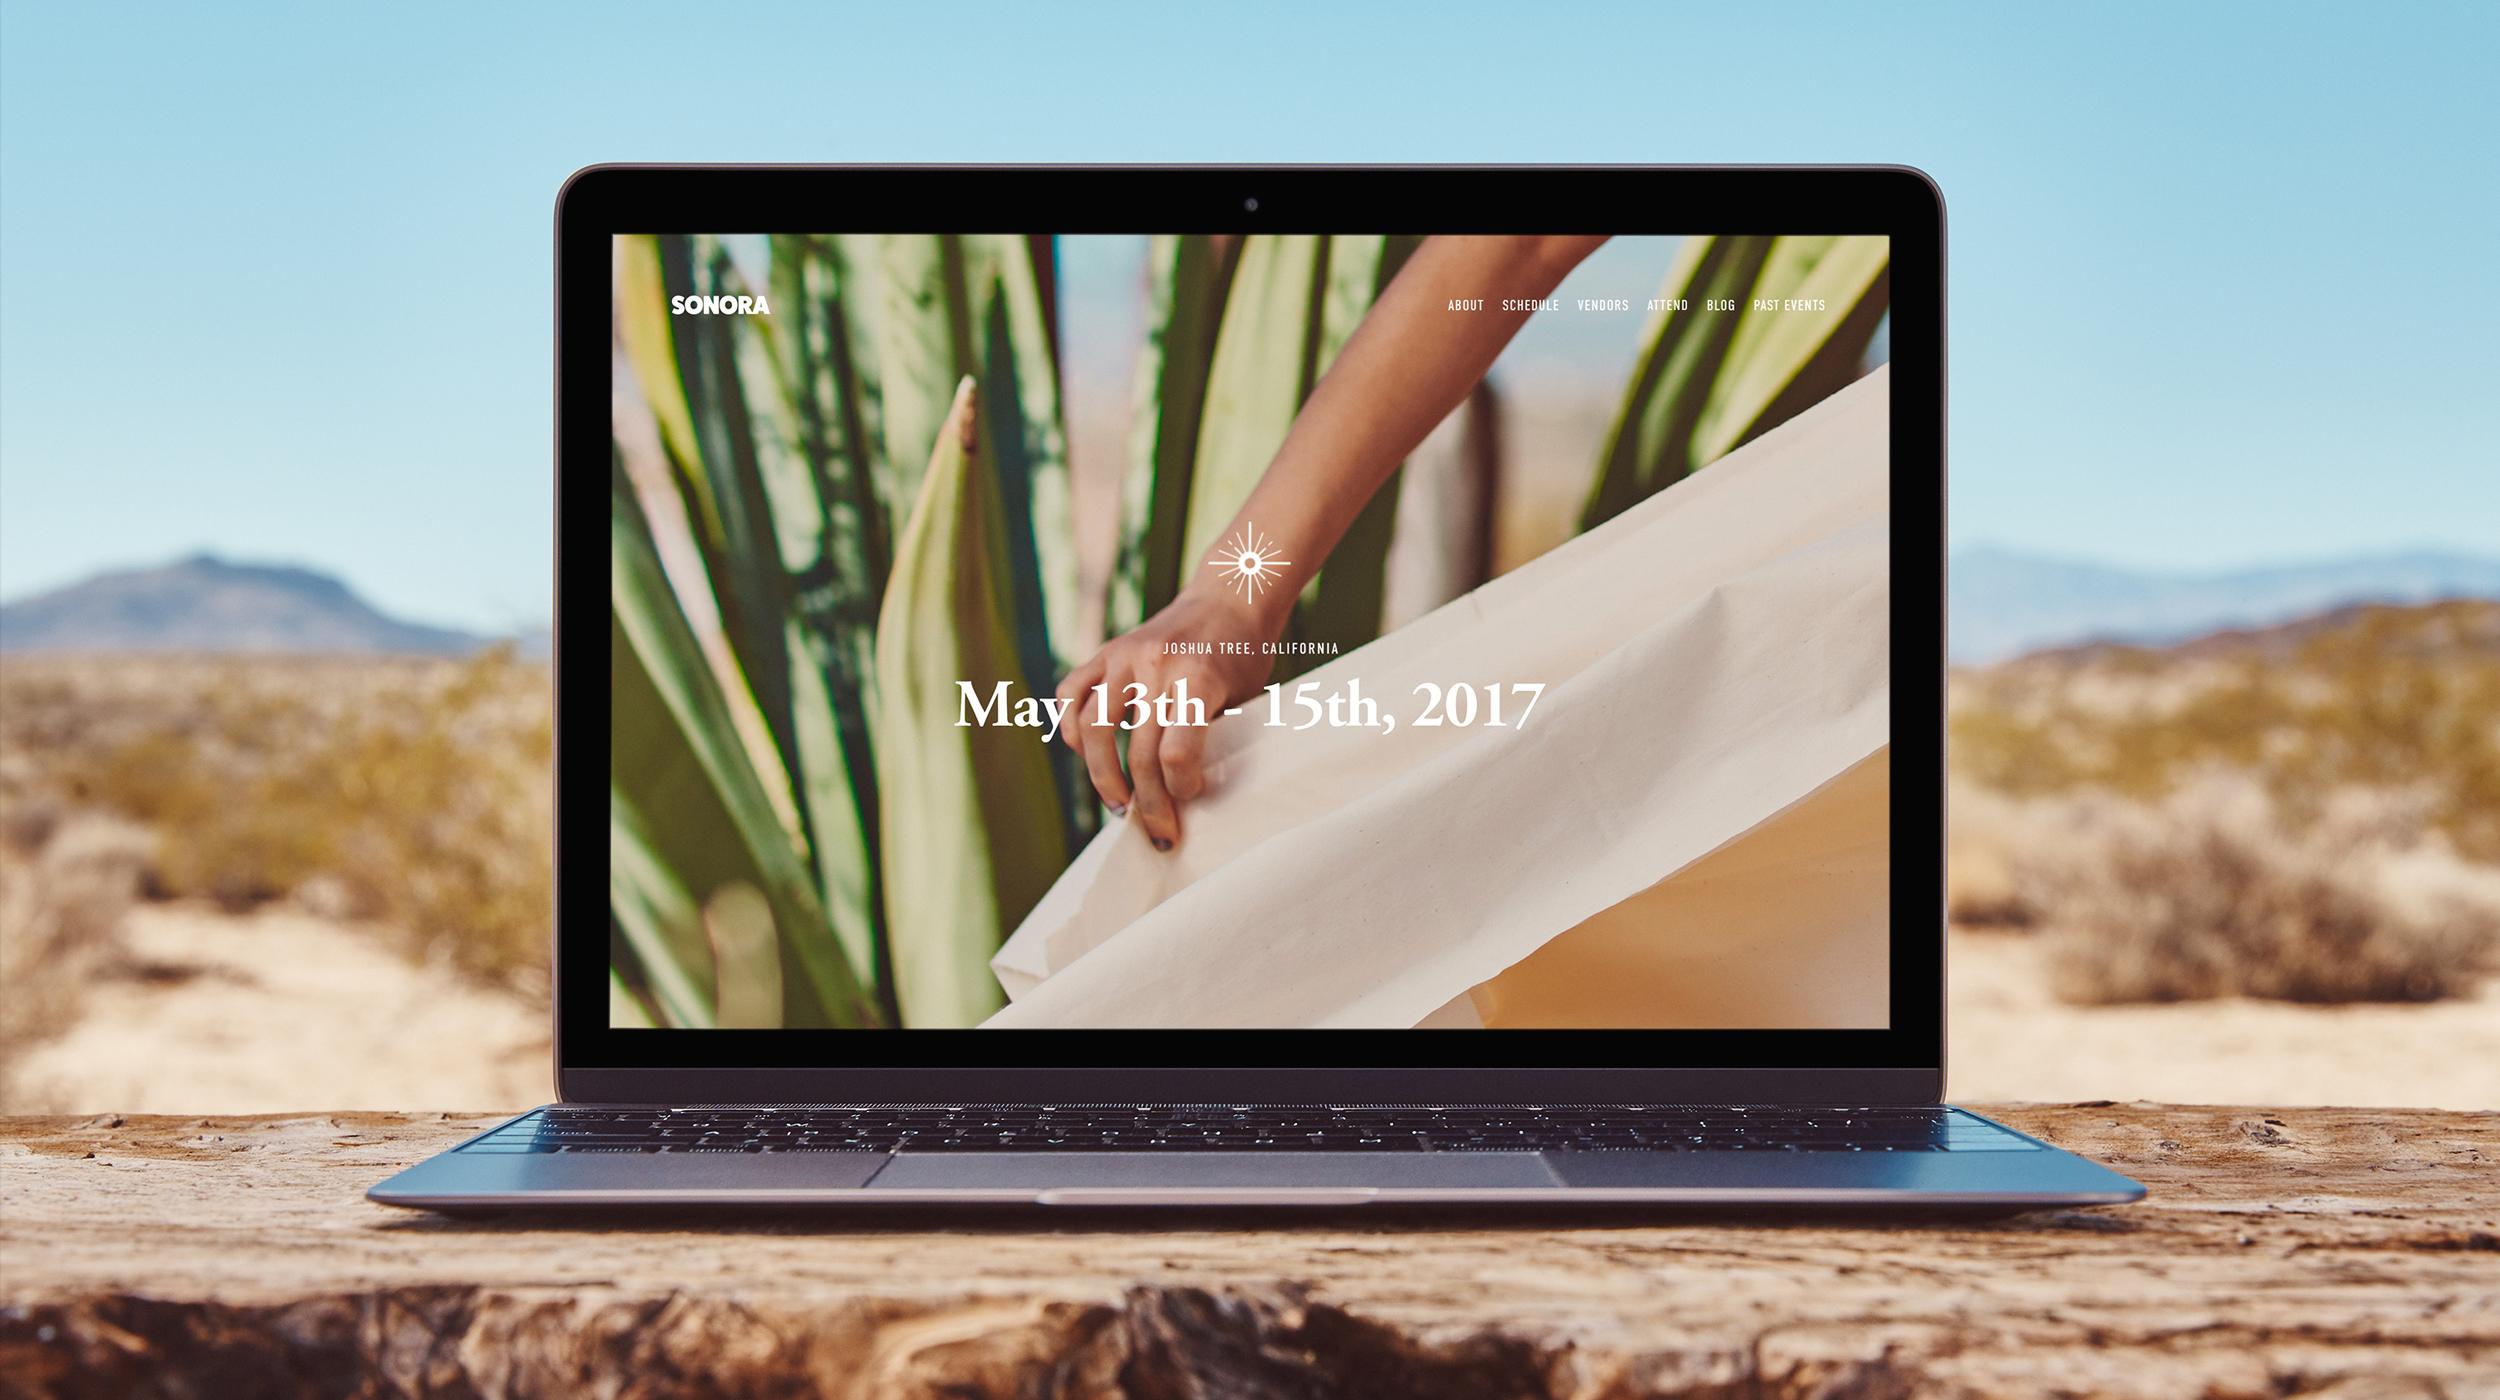 Sonora - Web / Branding